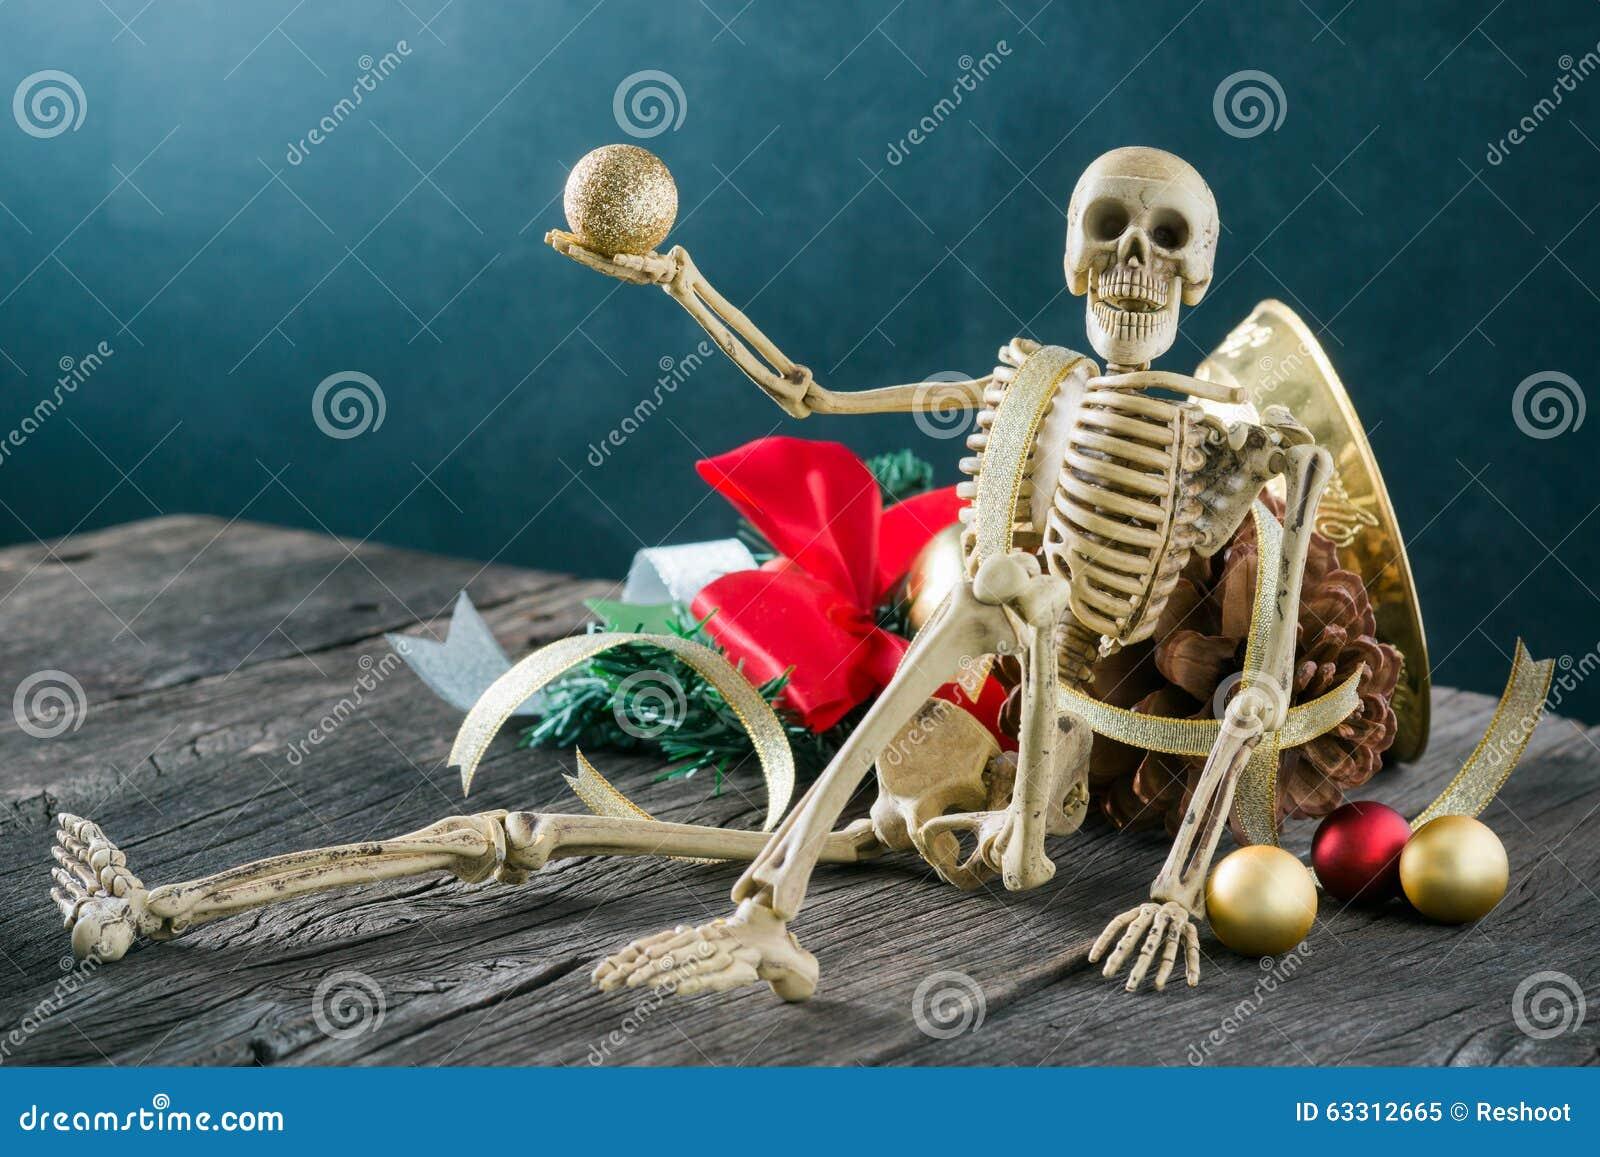 Christmas Skeleton.Skeleton With Christmas Decoration Stock Image Image Of